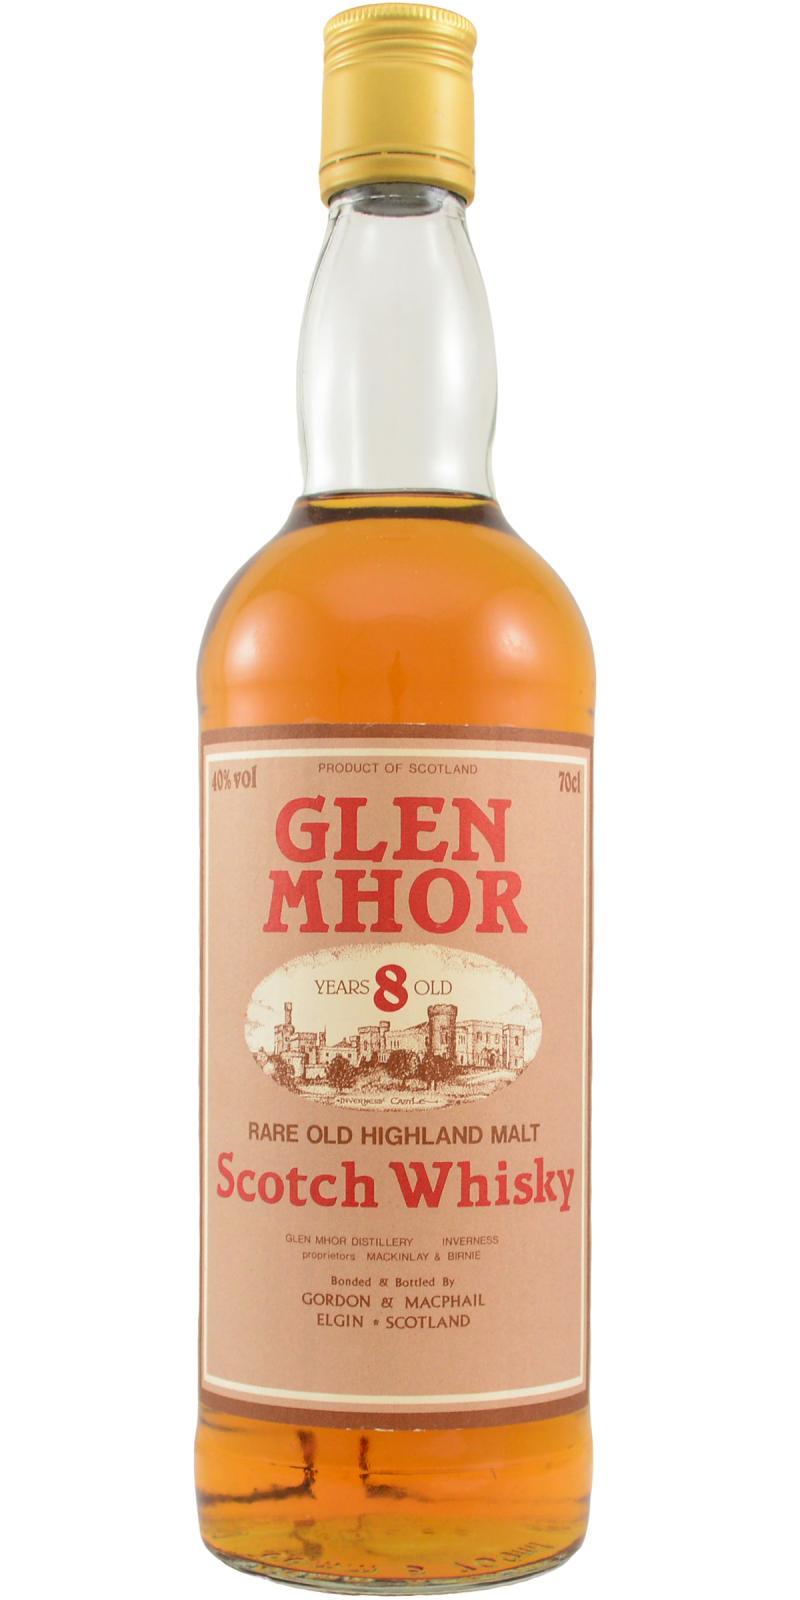 Glen Mhor 08-year-old GM